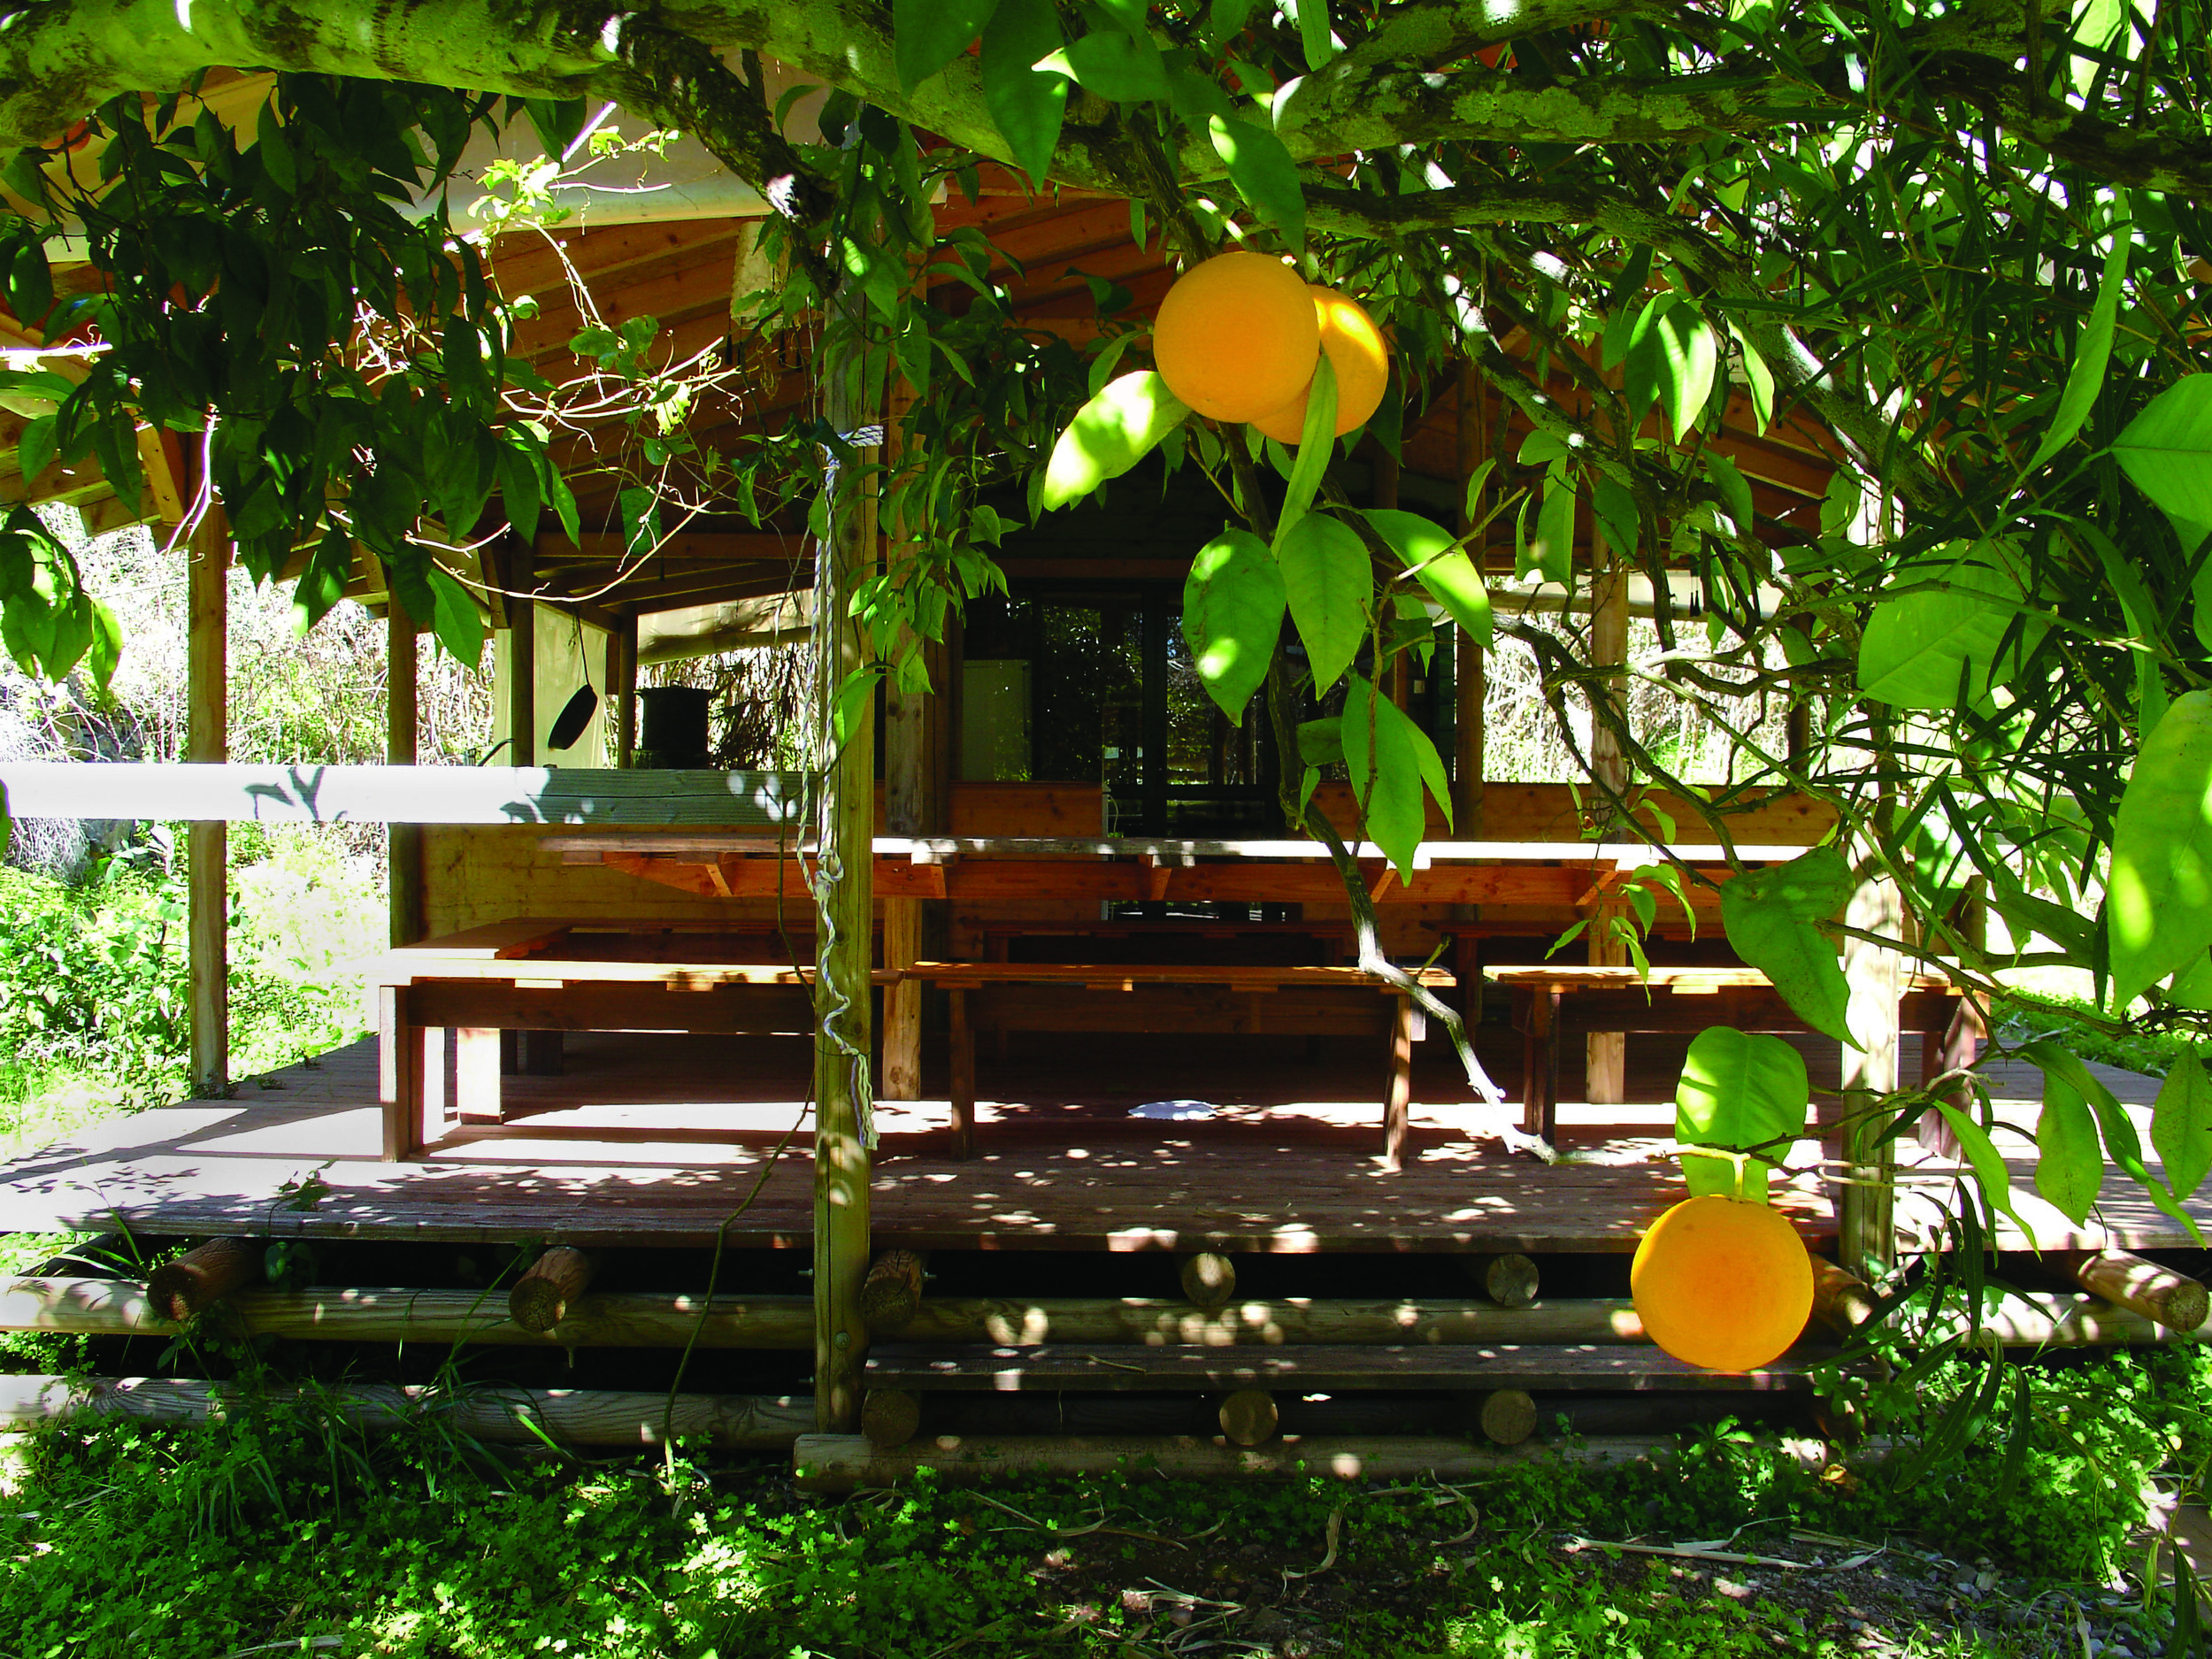 Oranges-export.jpg